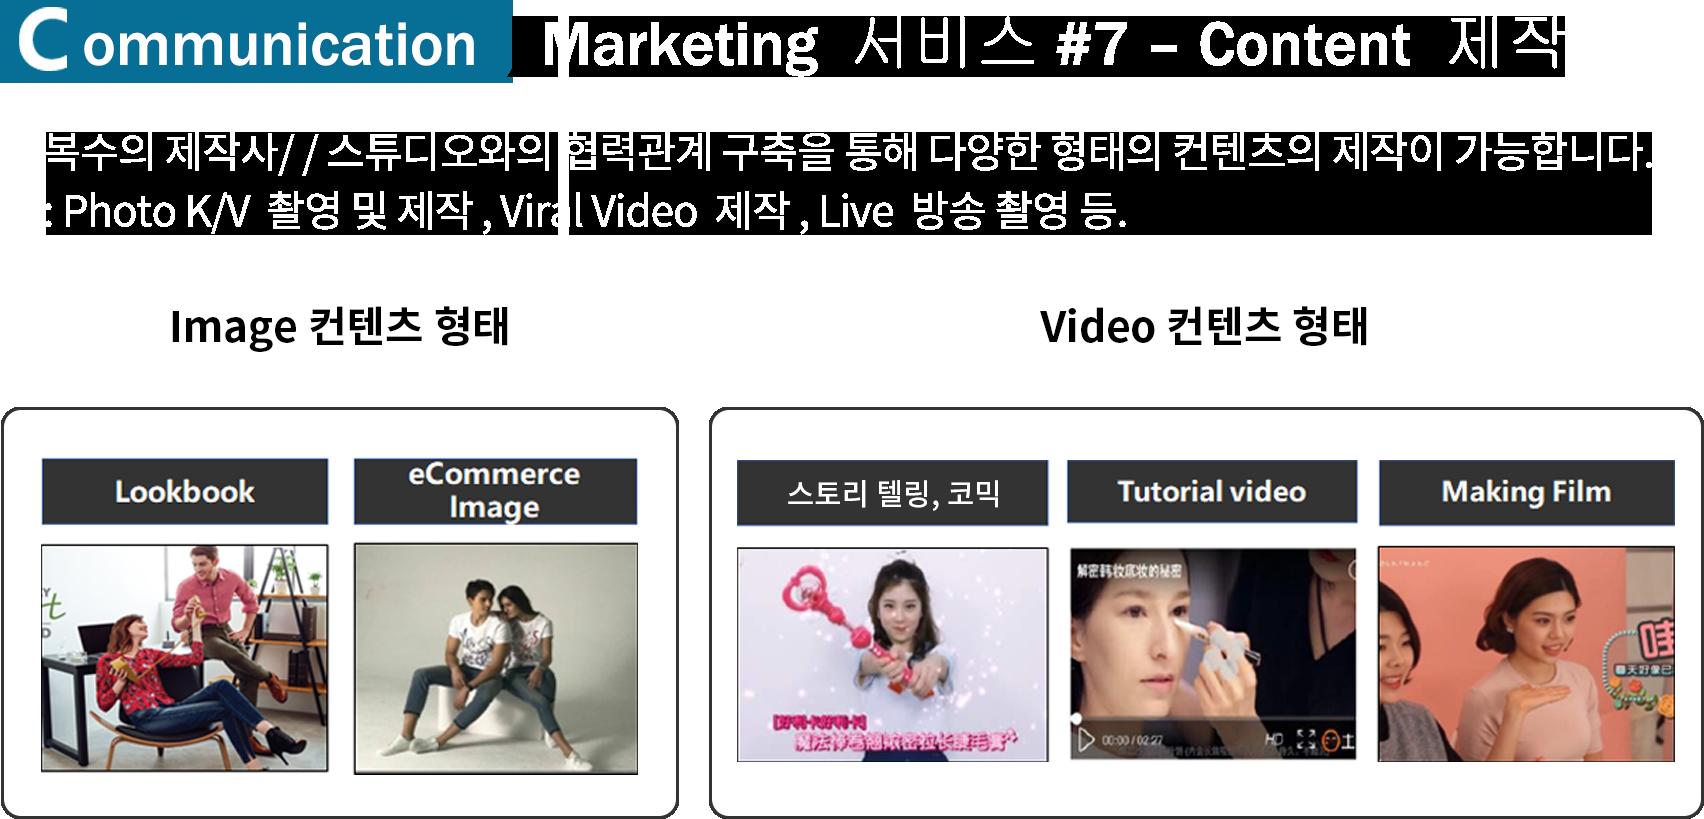 Communication-7韩文